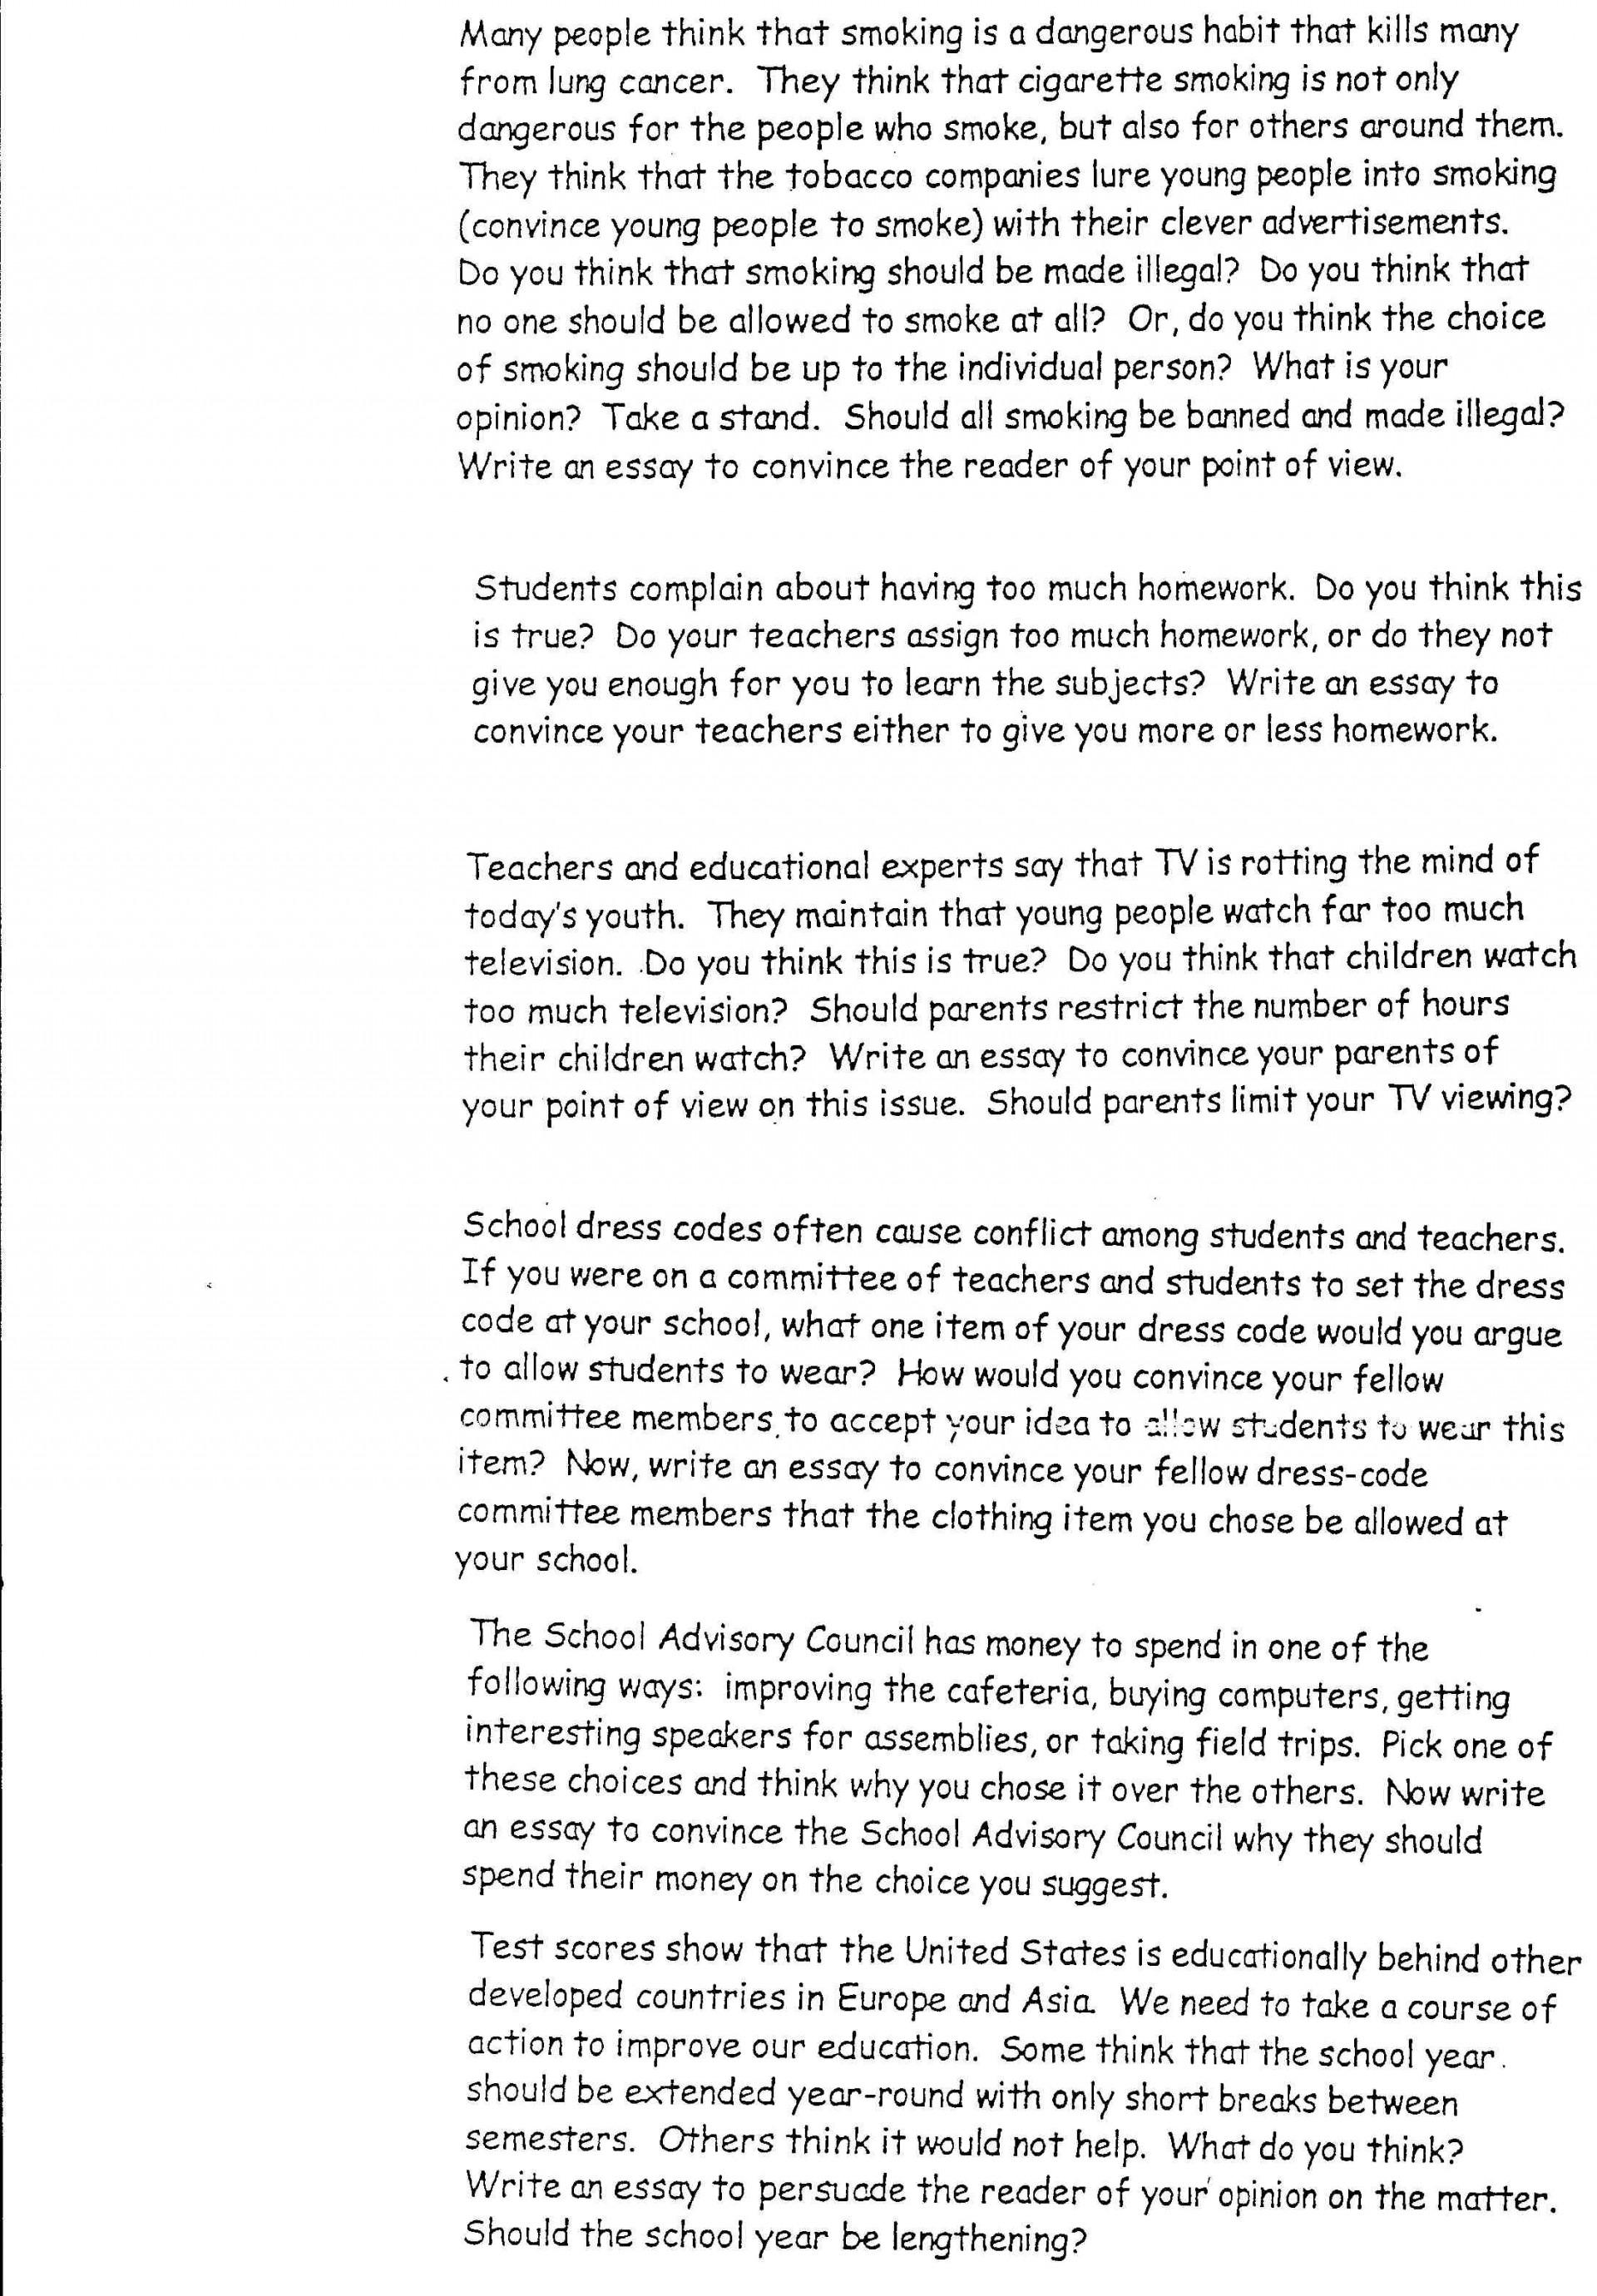 020 Interesting Essay Topics Argumentative Persuasive L Amazing For Grade 7 9 Pat 7th 1920